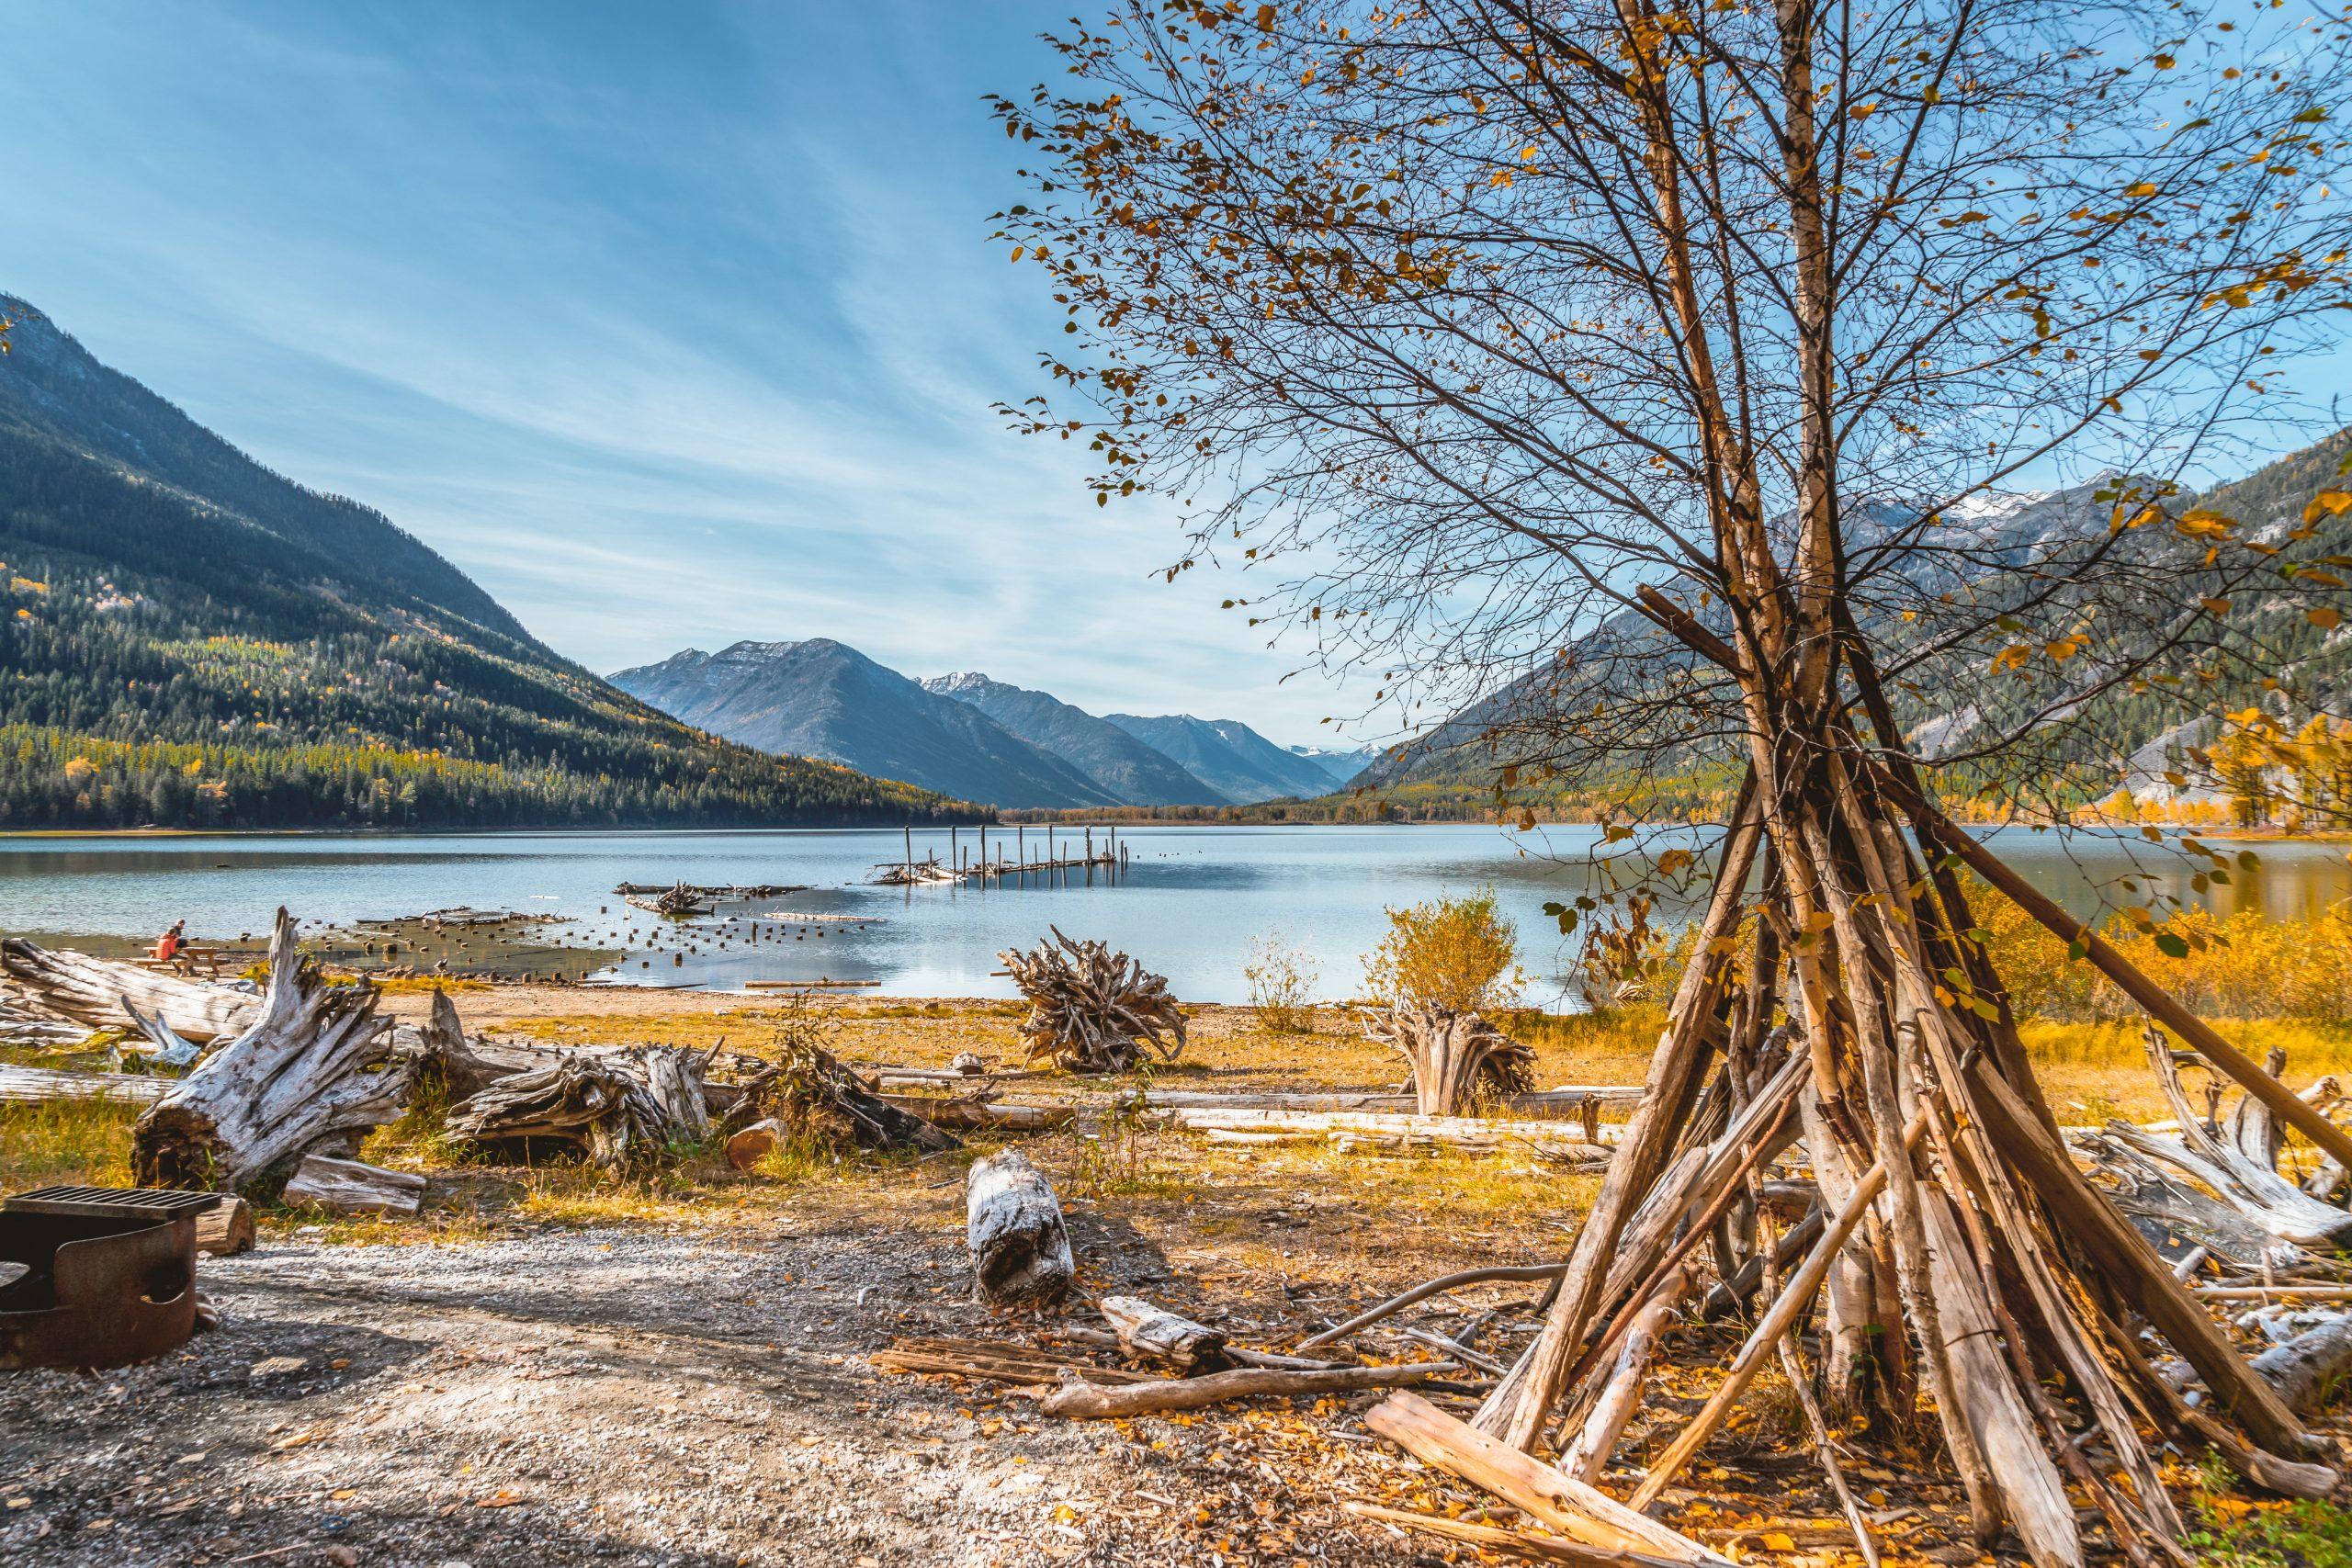 St. Mary's Lake, Cranbrook, BC Kimberley BC Kootenays